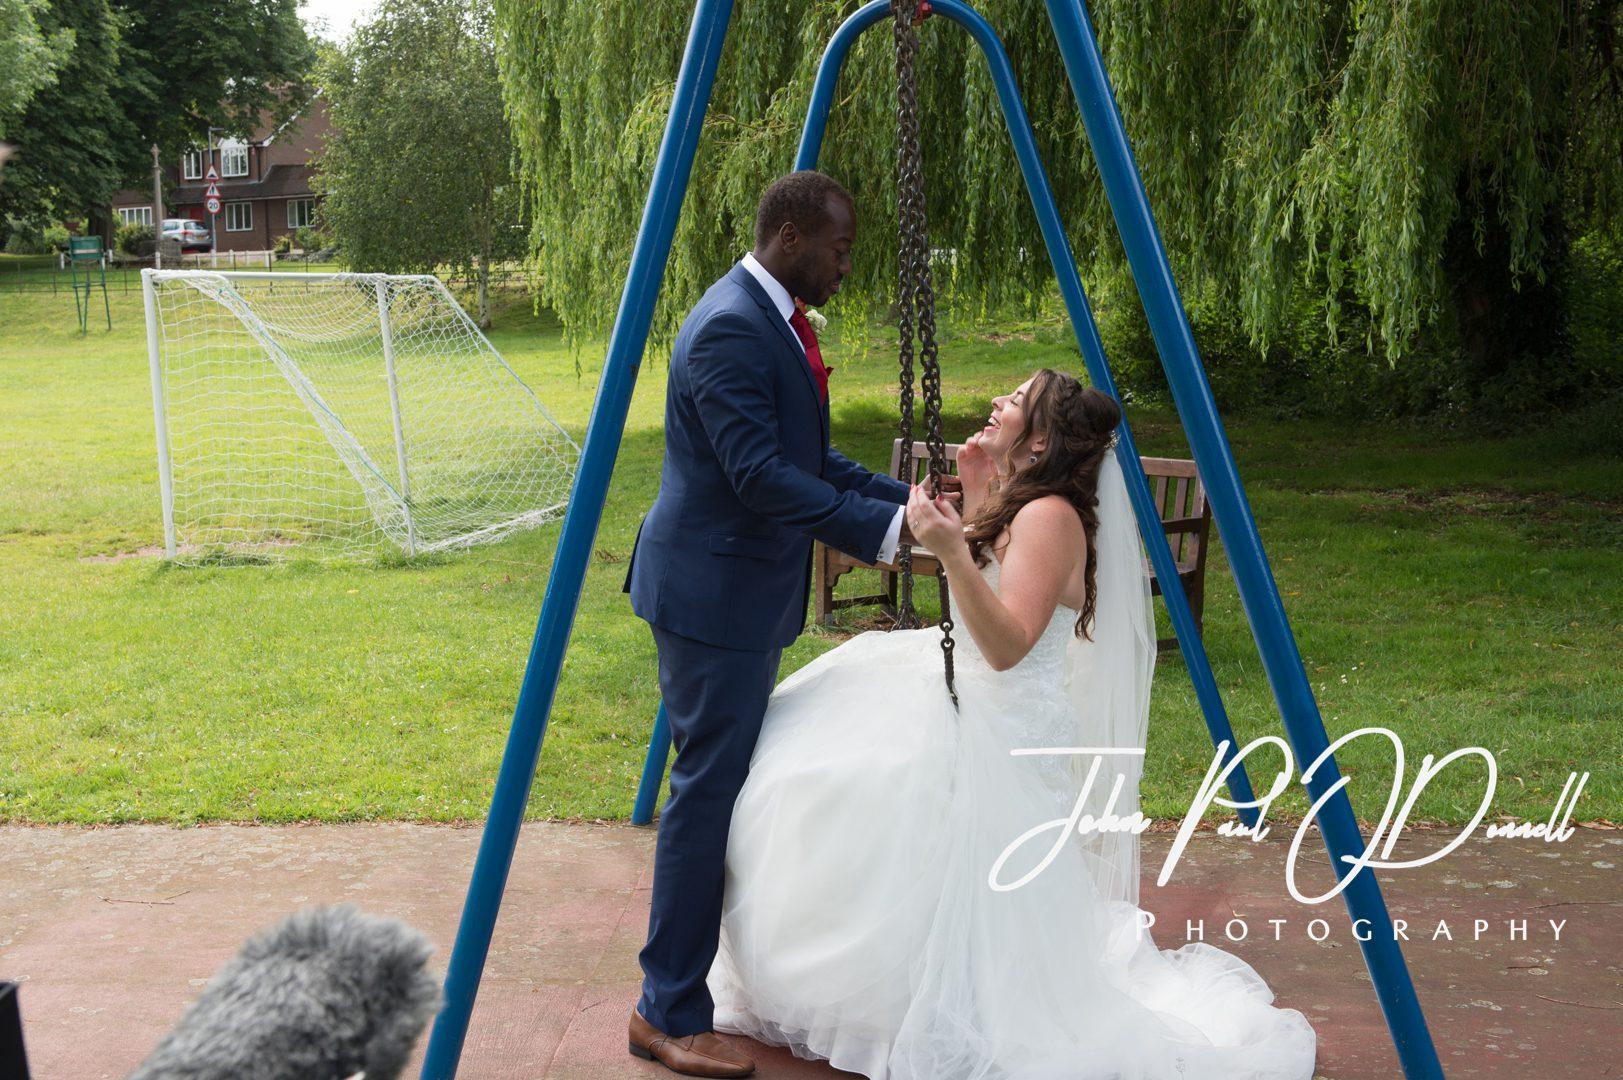 Rebecca and Ricardos wedding at Mayflower Place Hertford